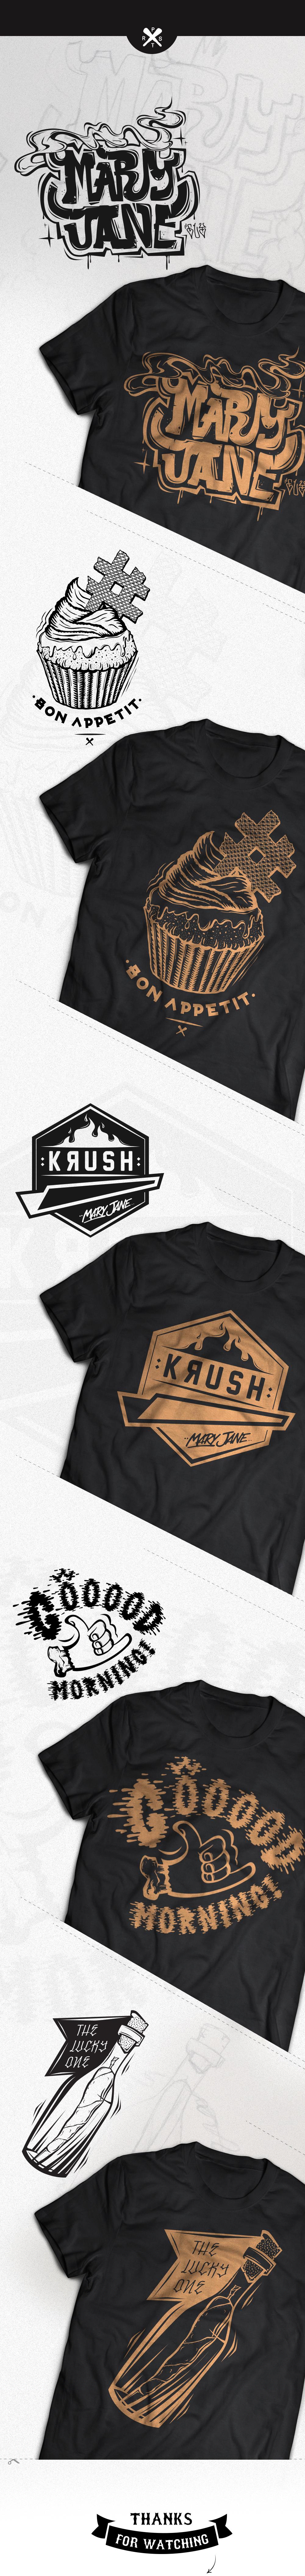 t-shirt hip hop koszulki Mary Jane vandals smoke